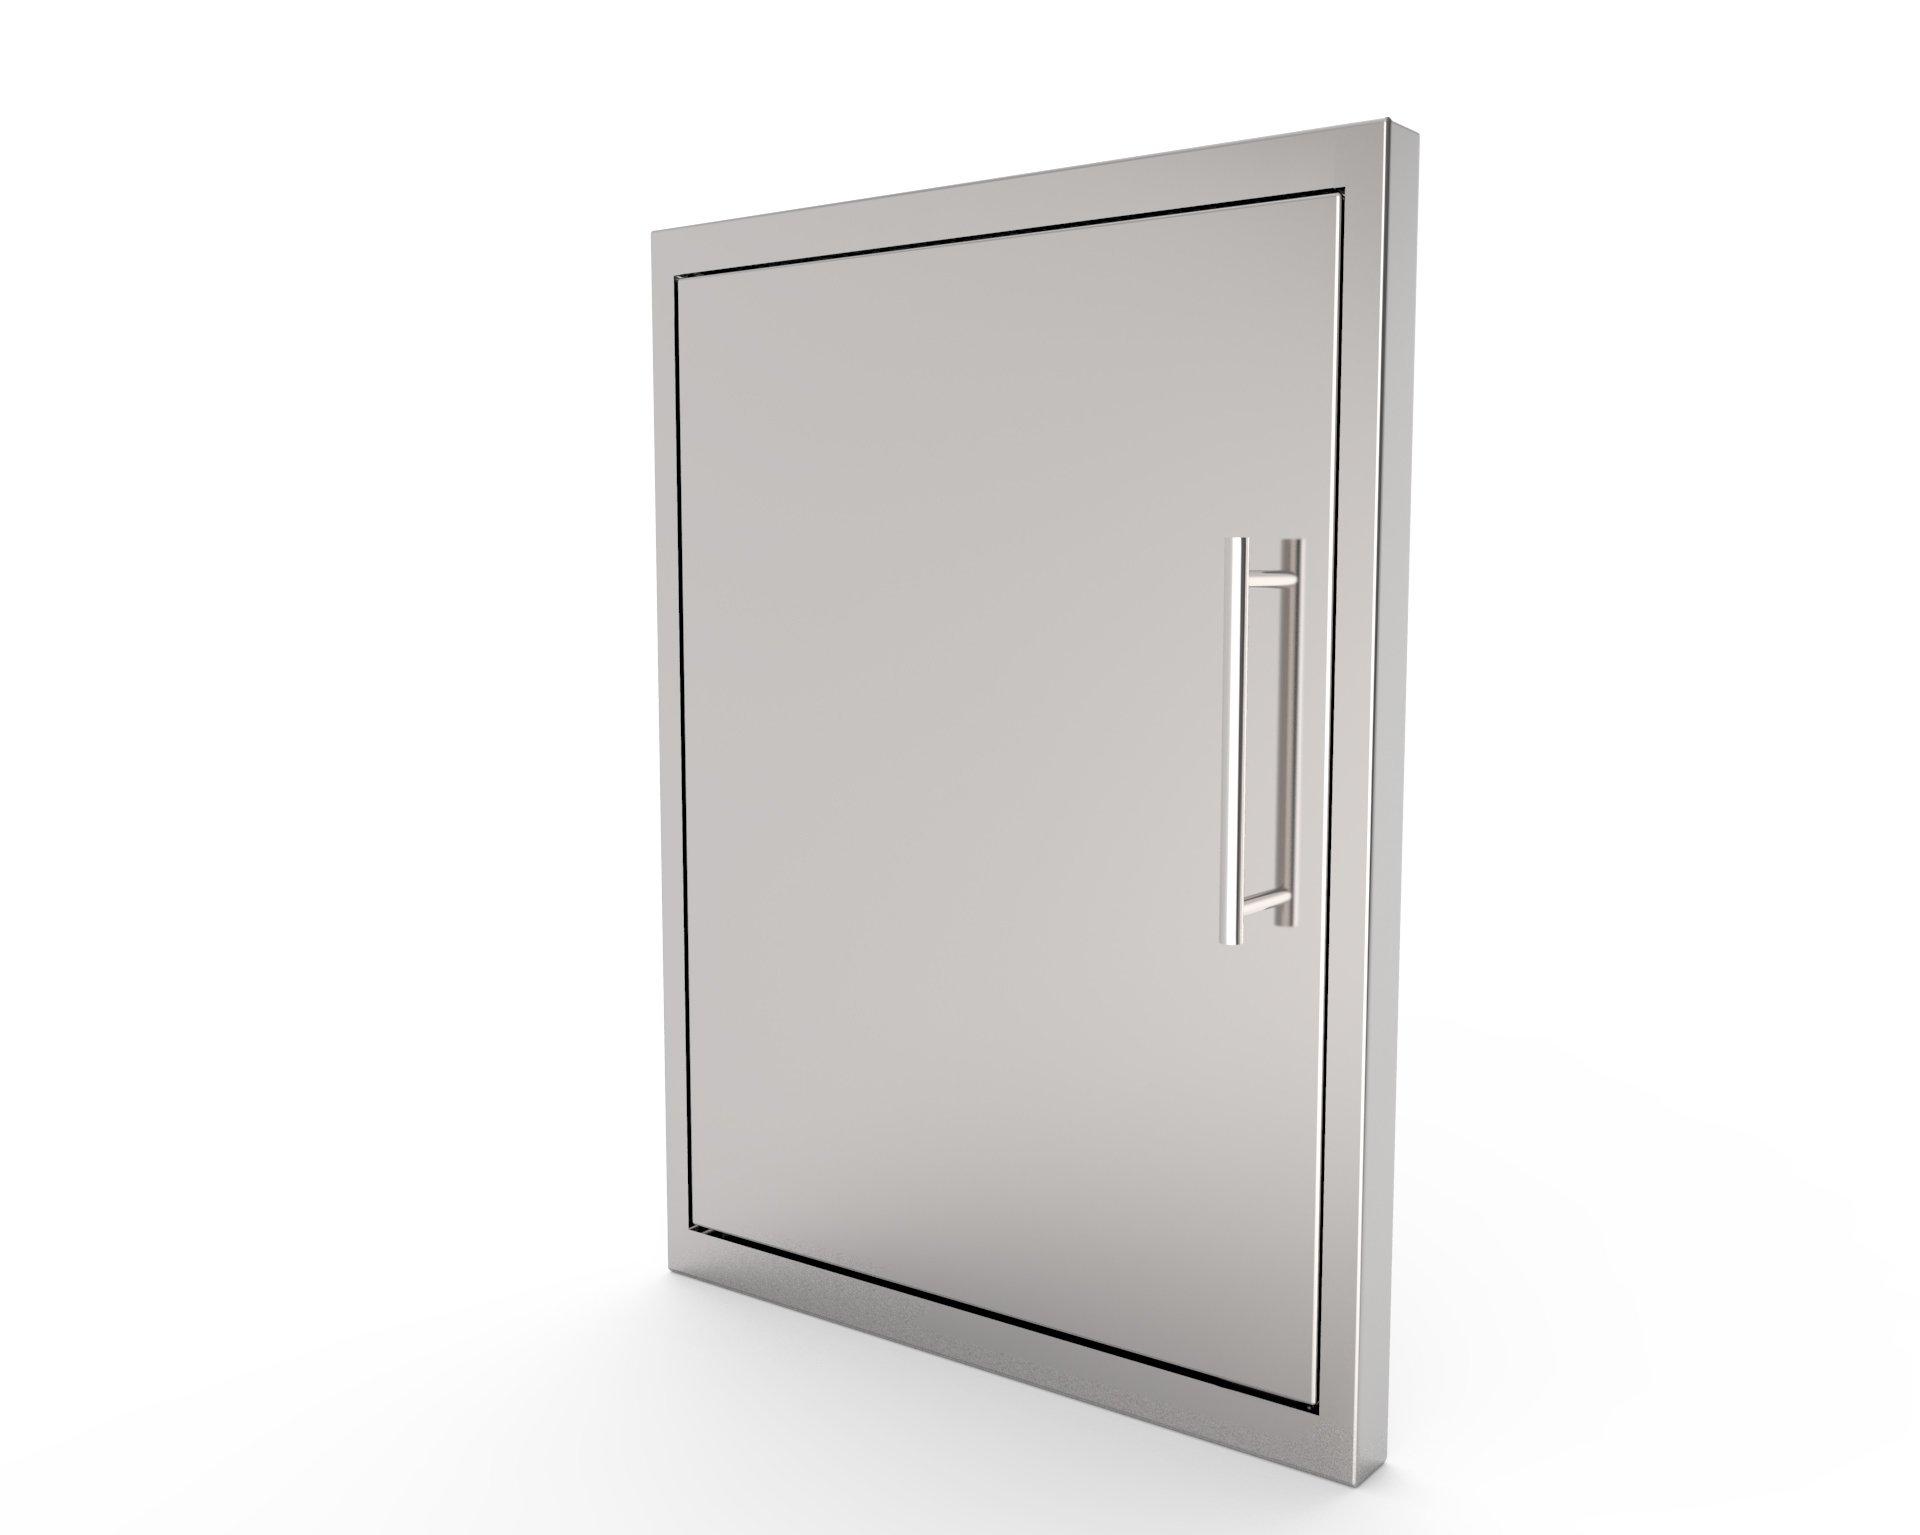 BBQ ACCESS DOOR NEW STYLE/Elegant/16 By 22 Inch/ 304 Grade Stainless Steel Bbq Island/Outdoor Kitchen Access Doors